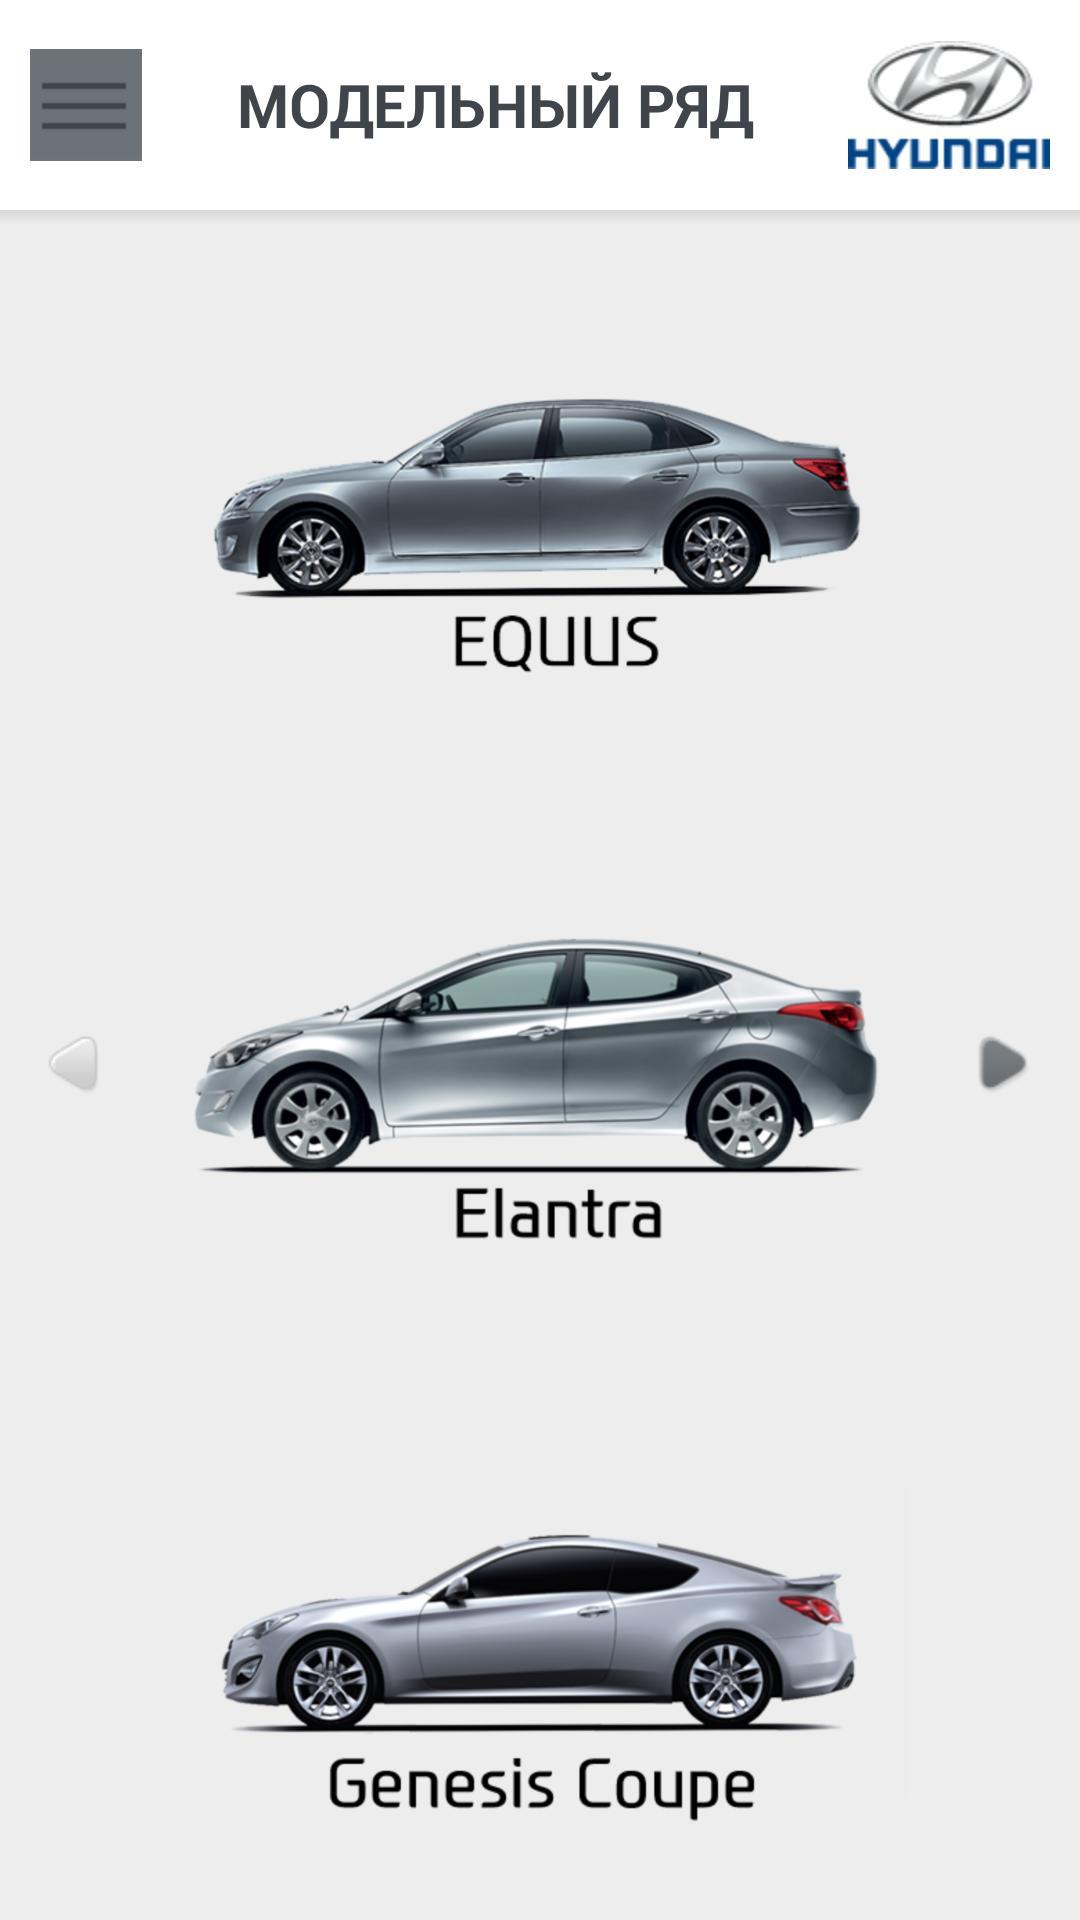 Hyundai: Smart Service poster